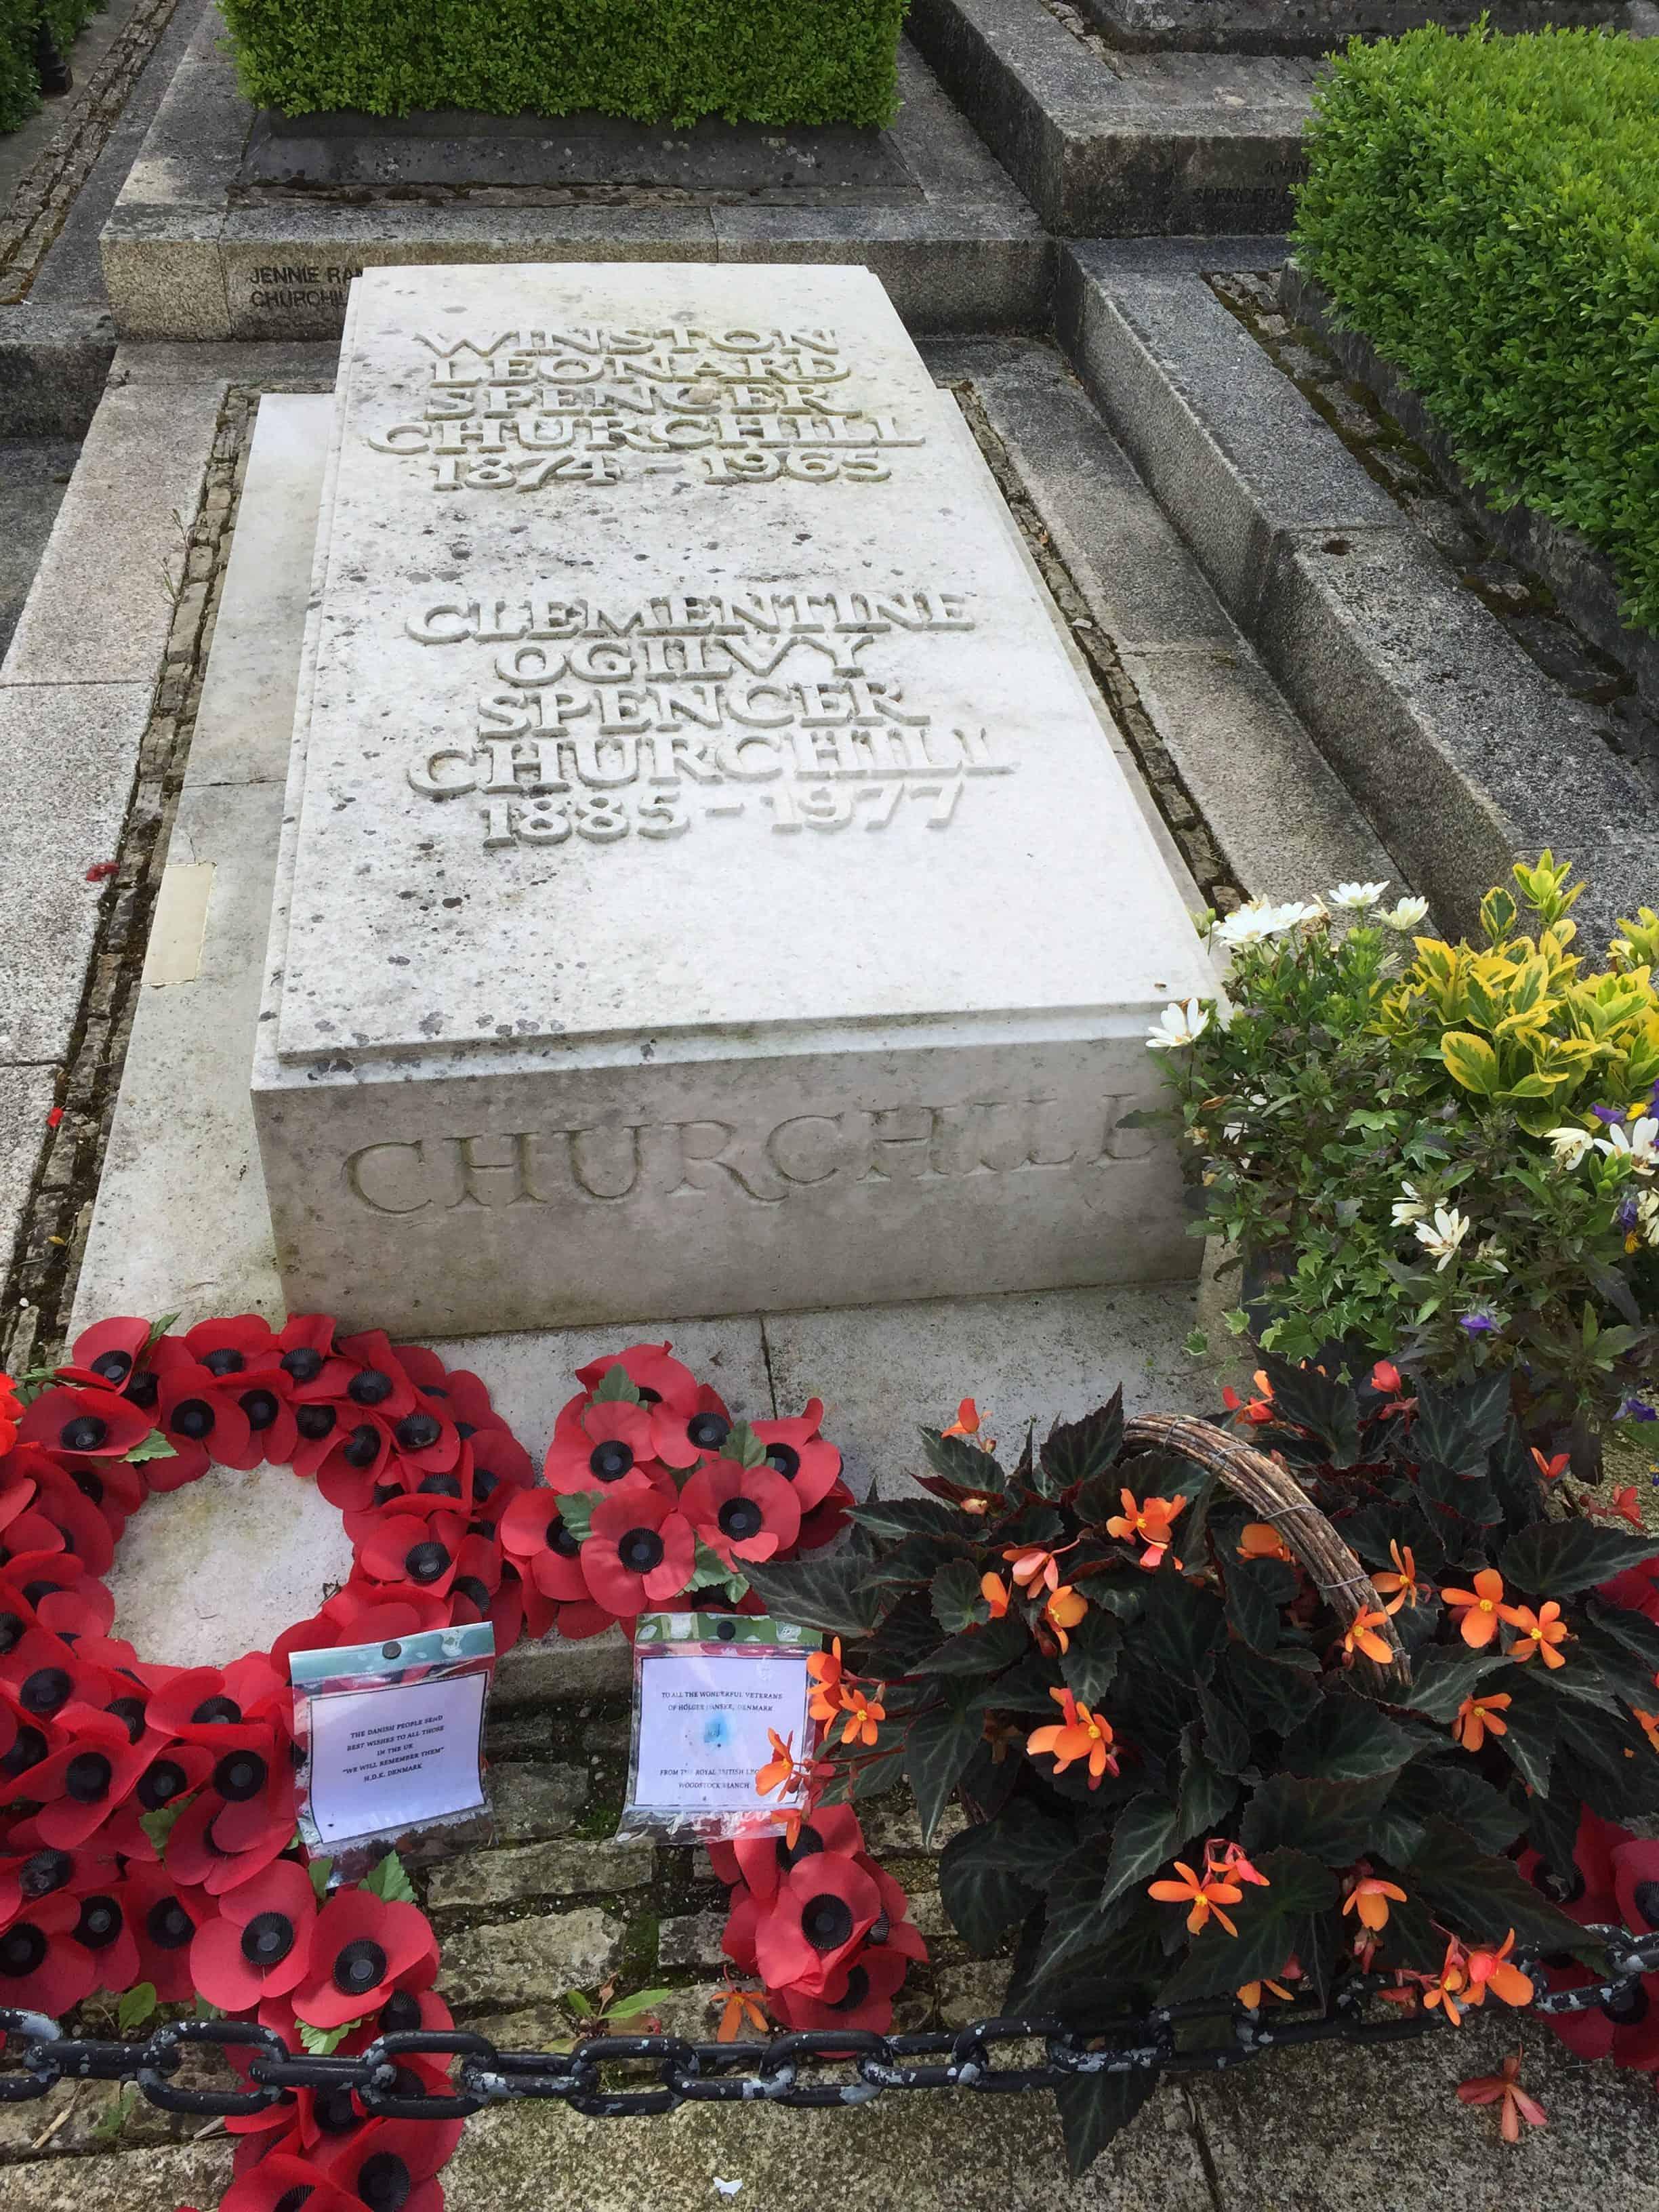 Churchil grave